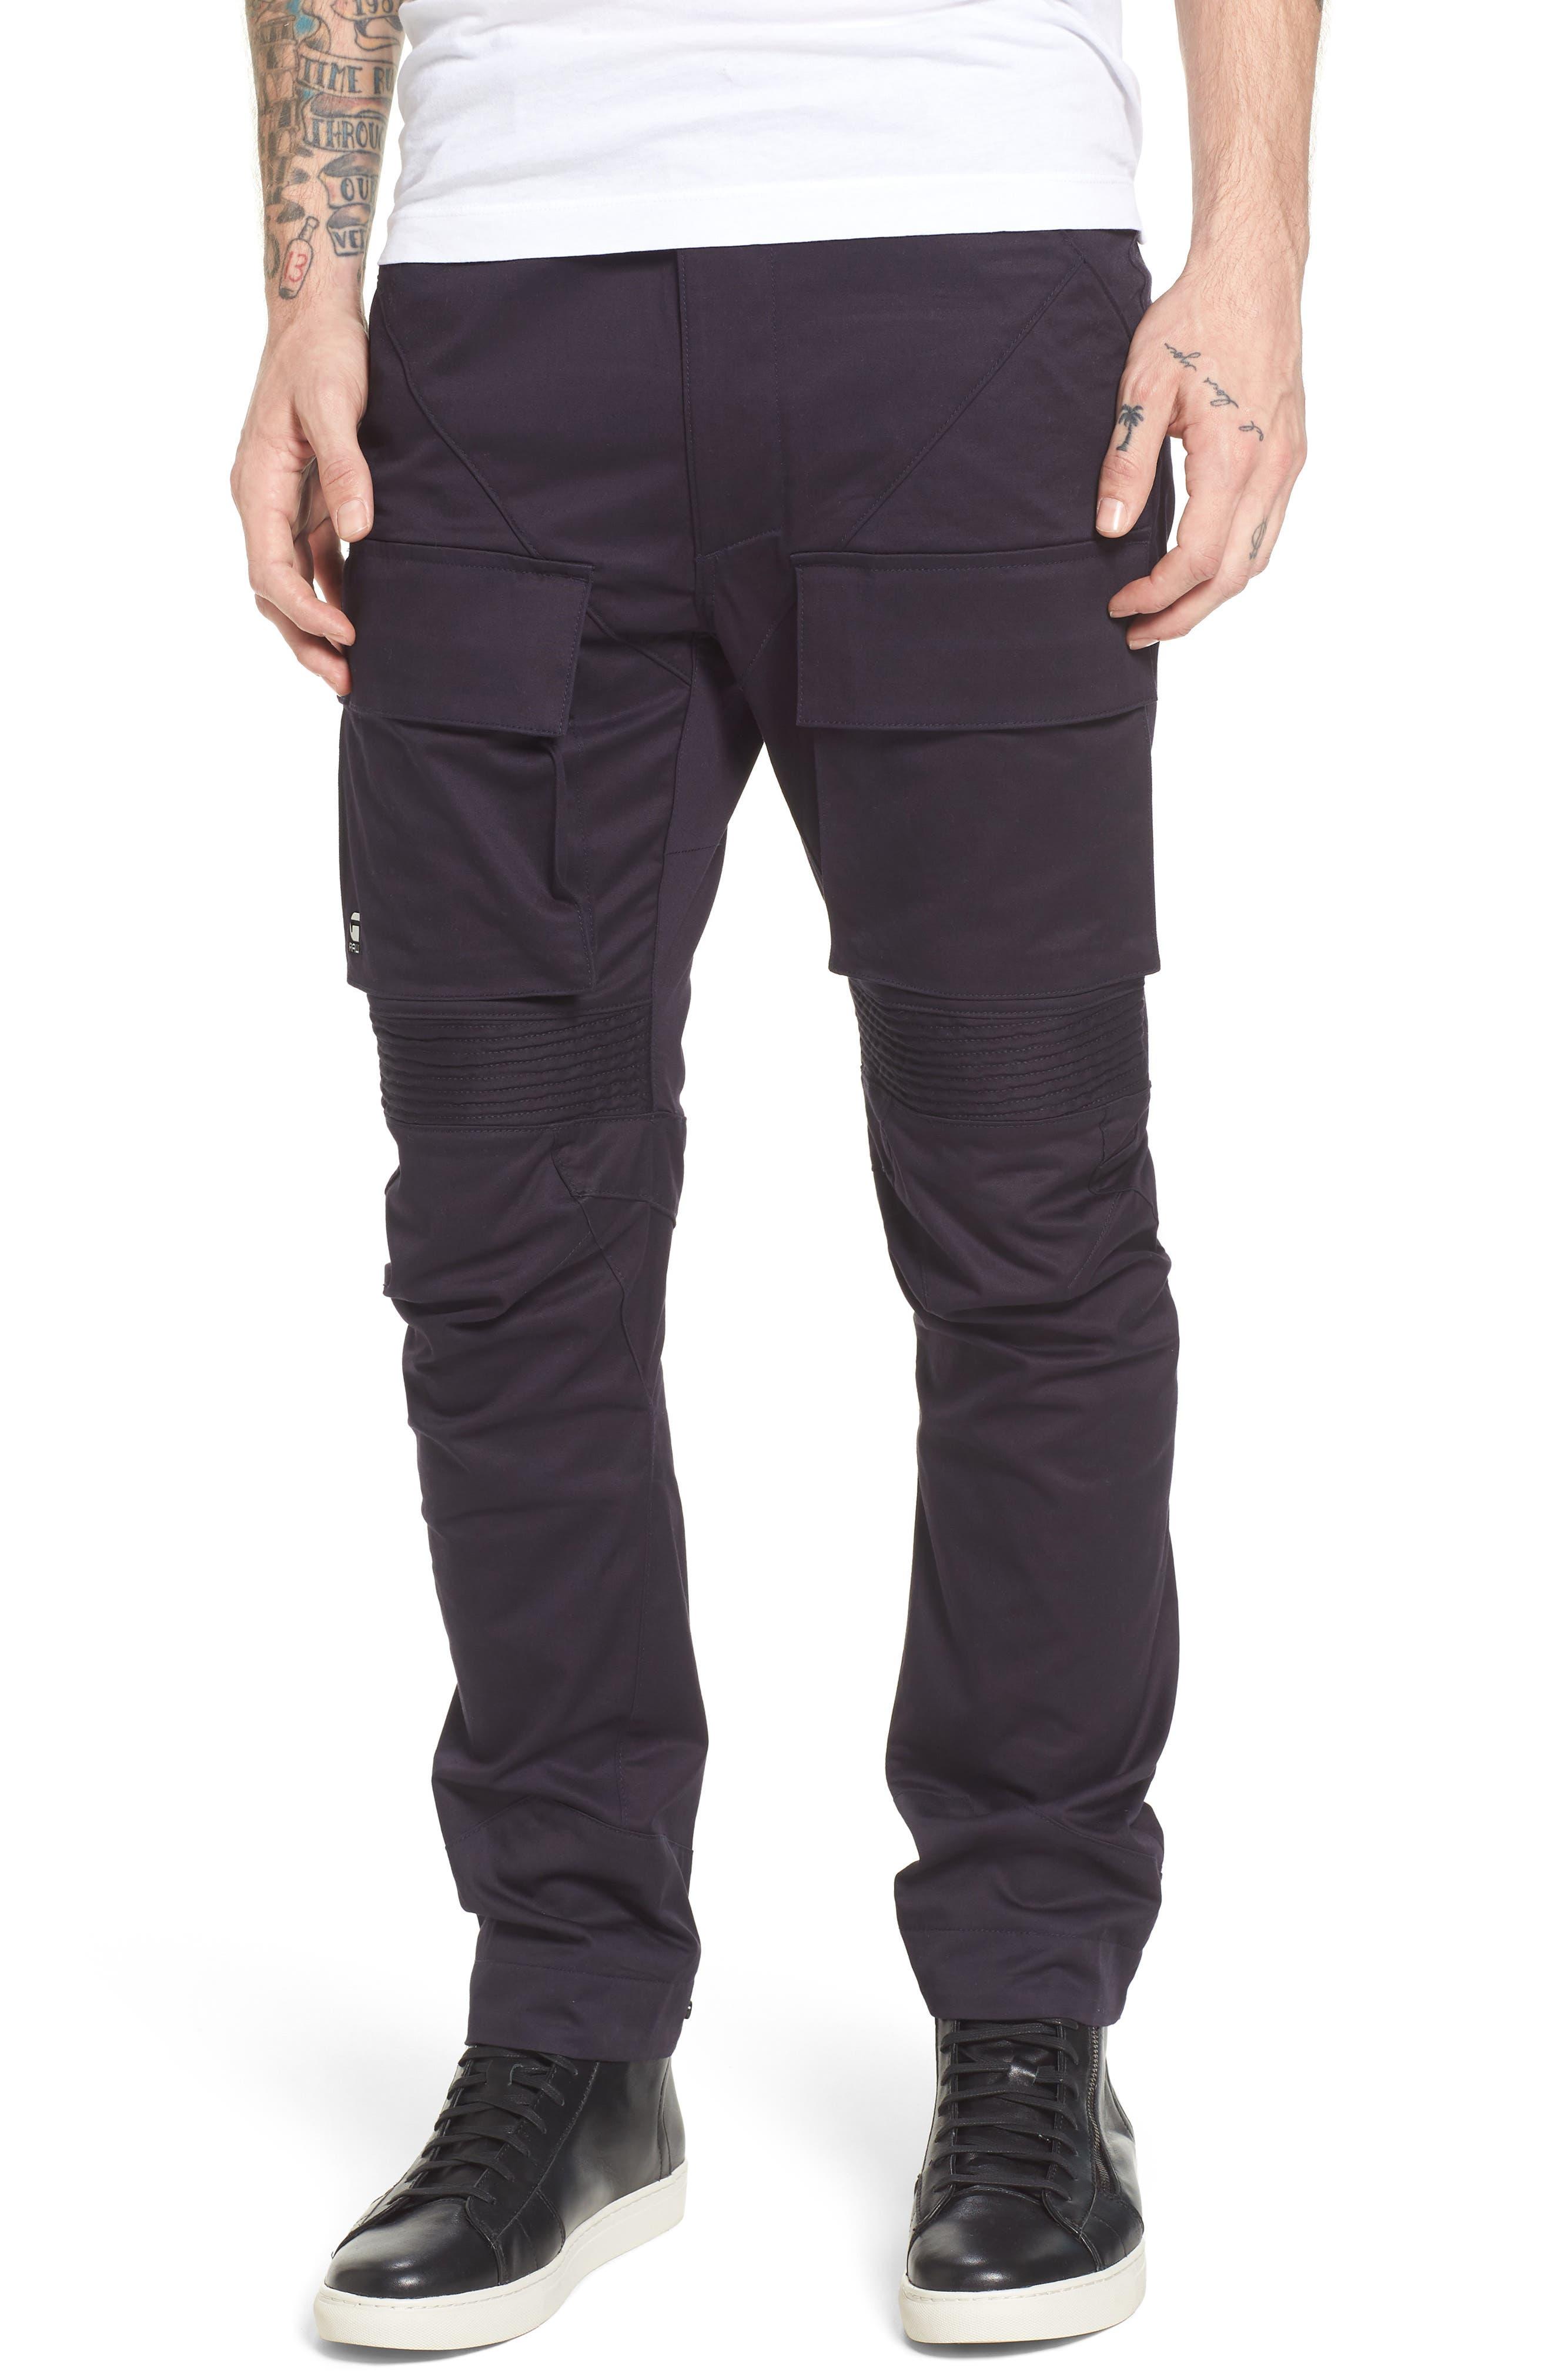 Vodan DC Slim Pants,                             Main thumbnail 1, color,                             Dark Naval Blue